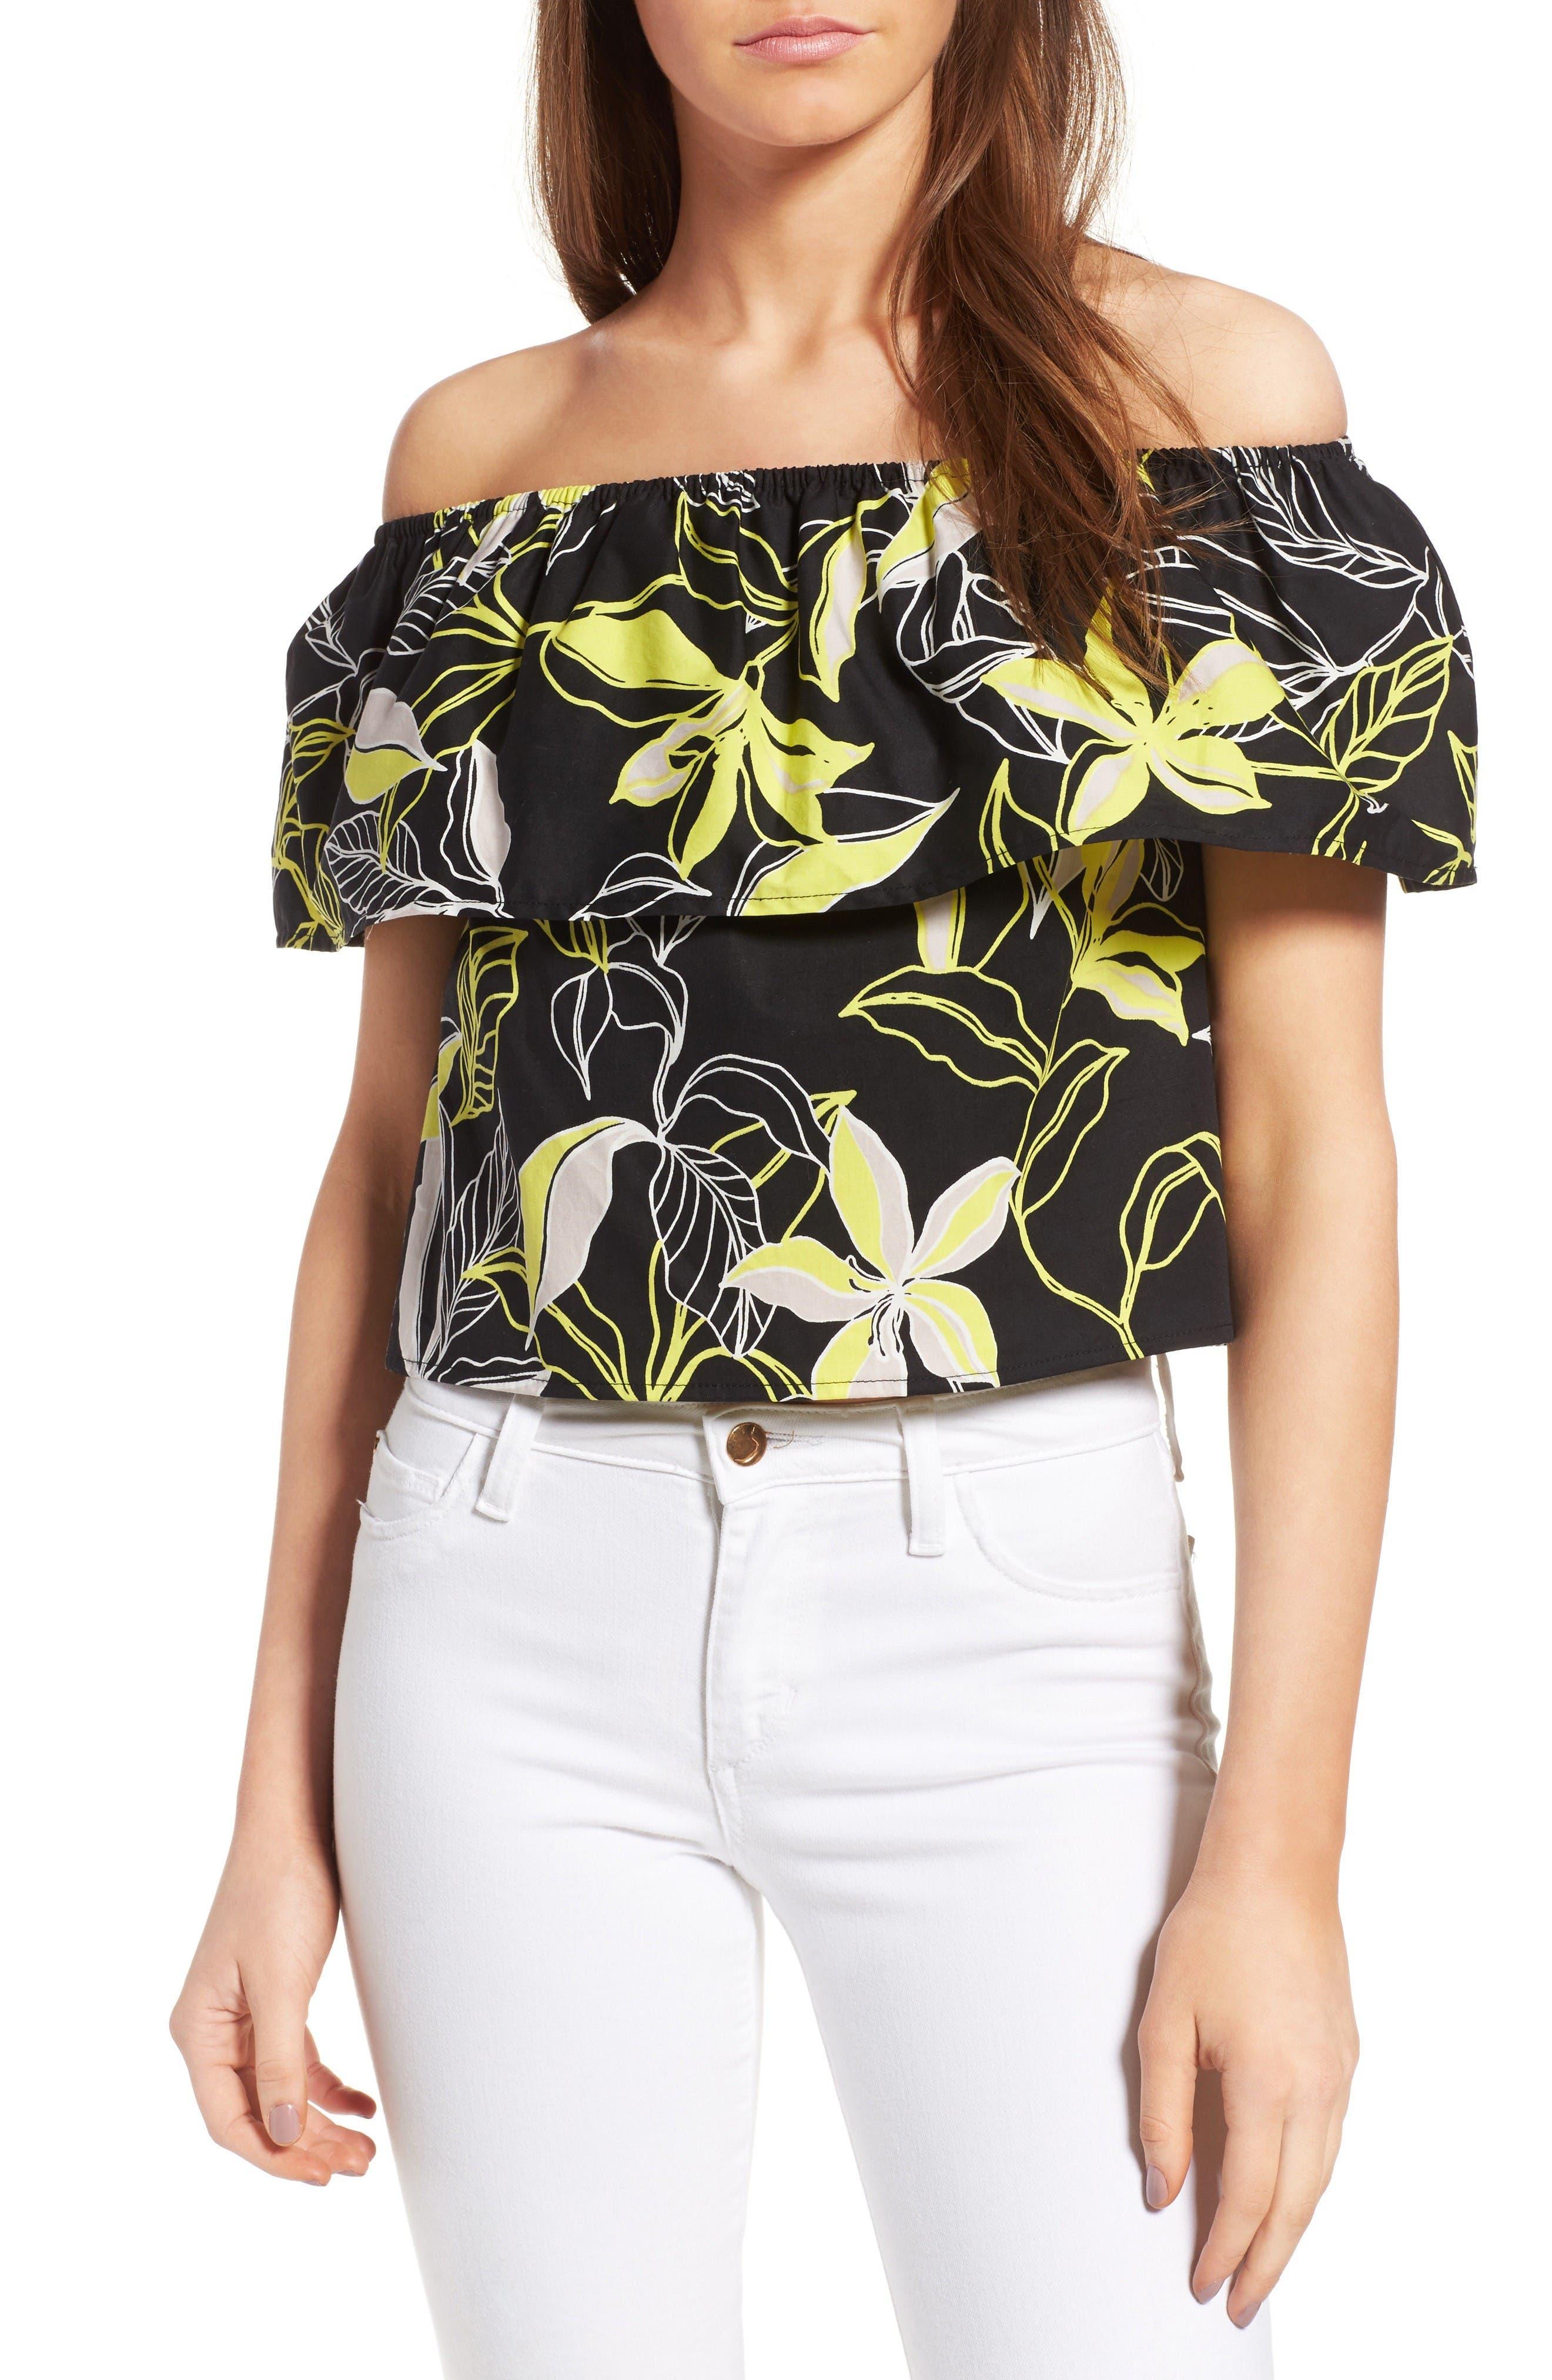 Splendid Tropic Floral Print Off the Shoulder Top